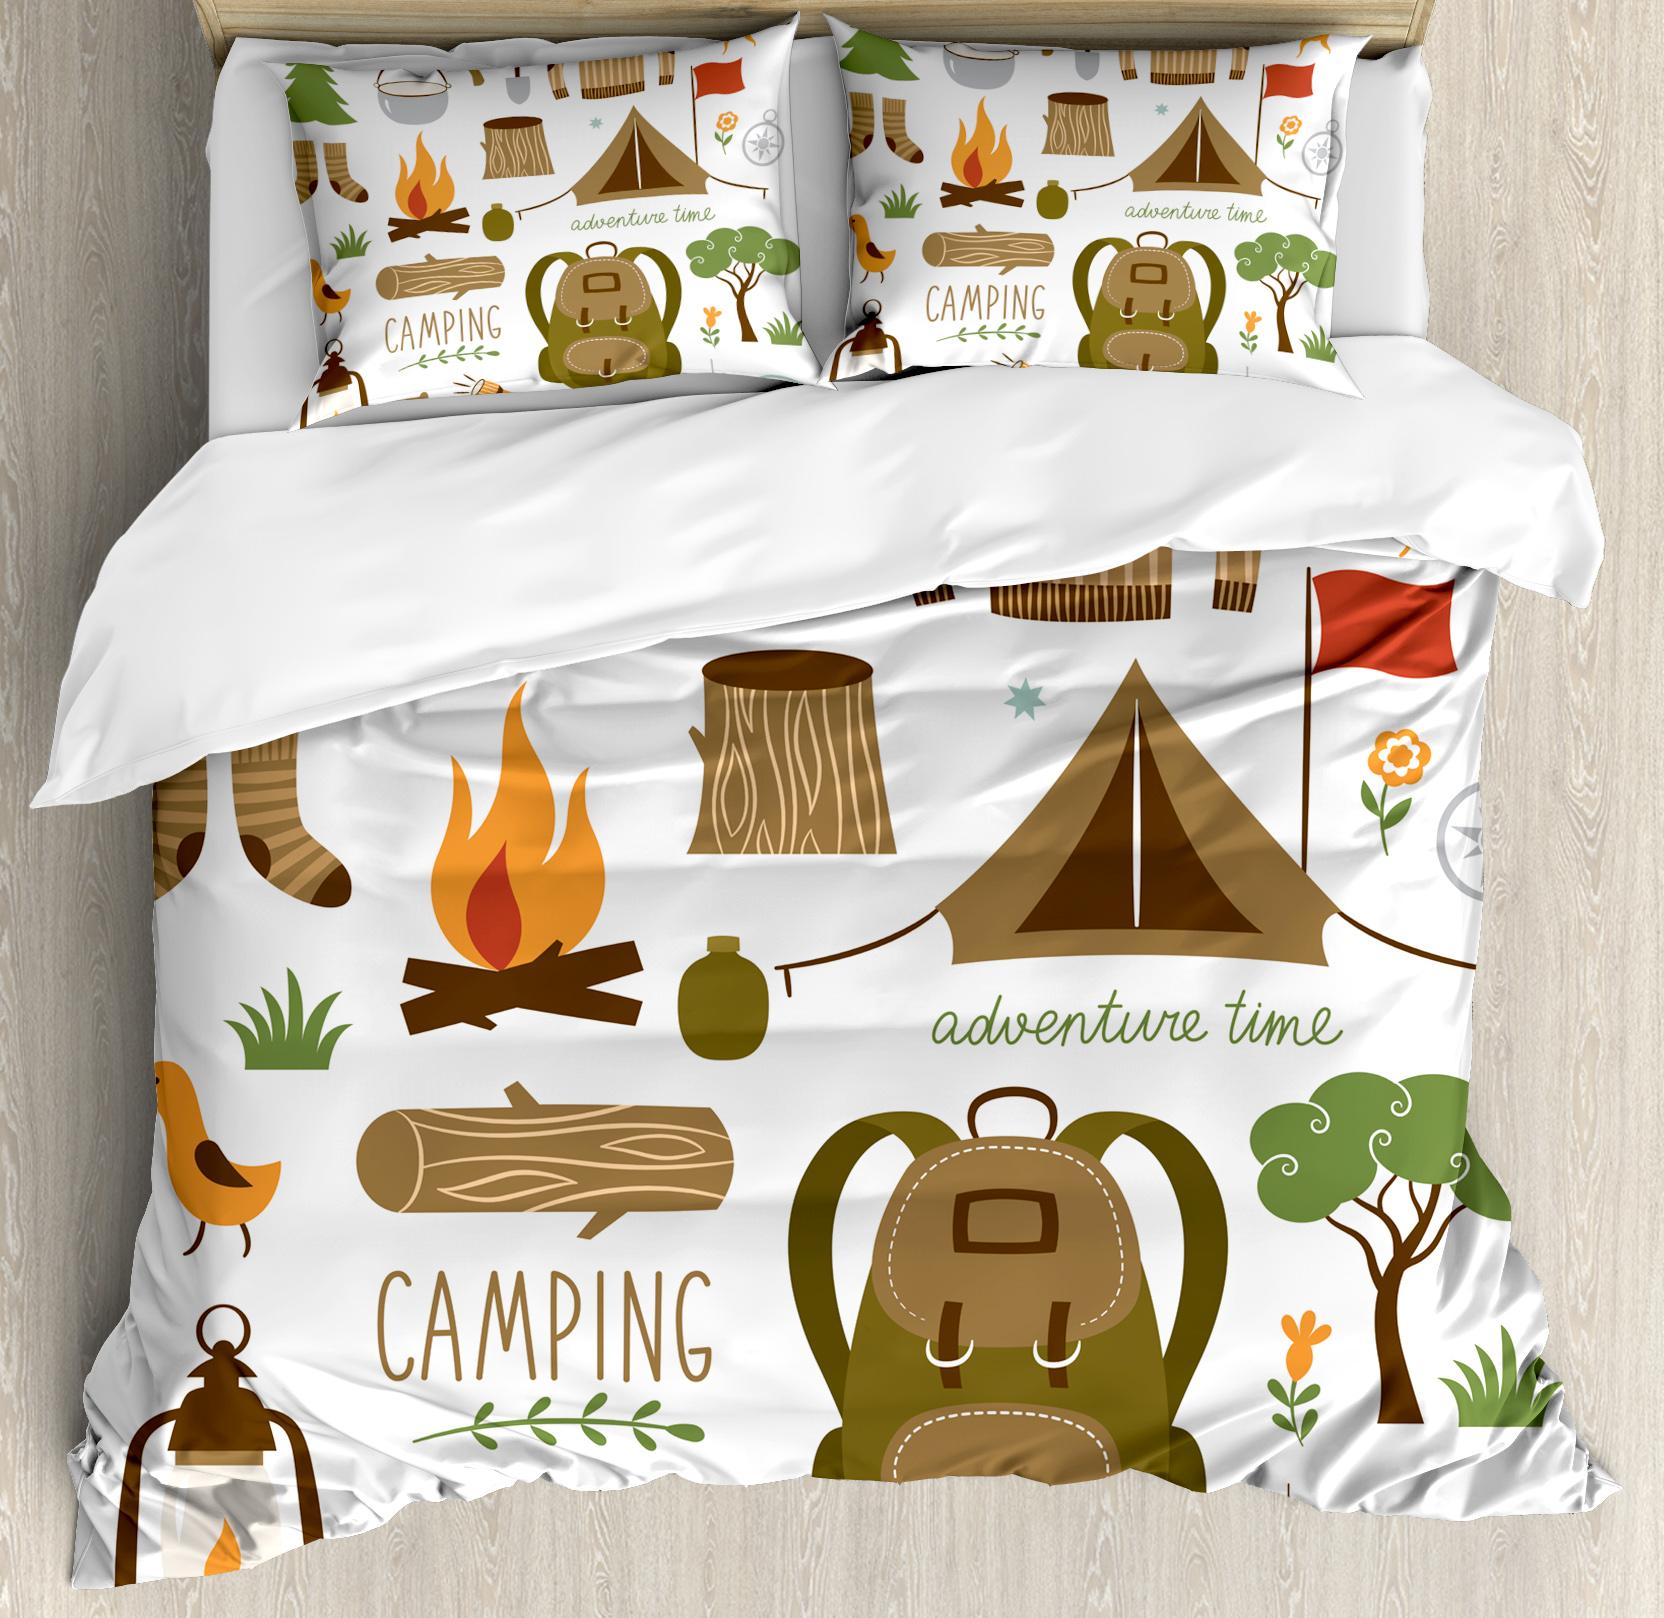 Adventure Queen Size Duvet Cover Set, Camping Equipment Sleeping Bag Boots Campfire Shovel Hatchet Log Artwork Print, Decorative 3 Piece Bedding Set with 2 Pillow Shams, Multicolor, by Ambesonne